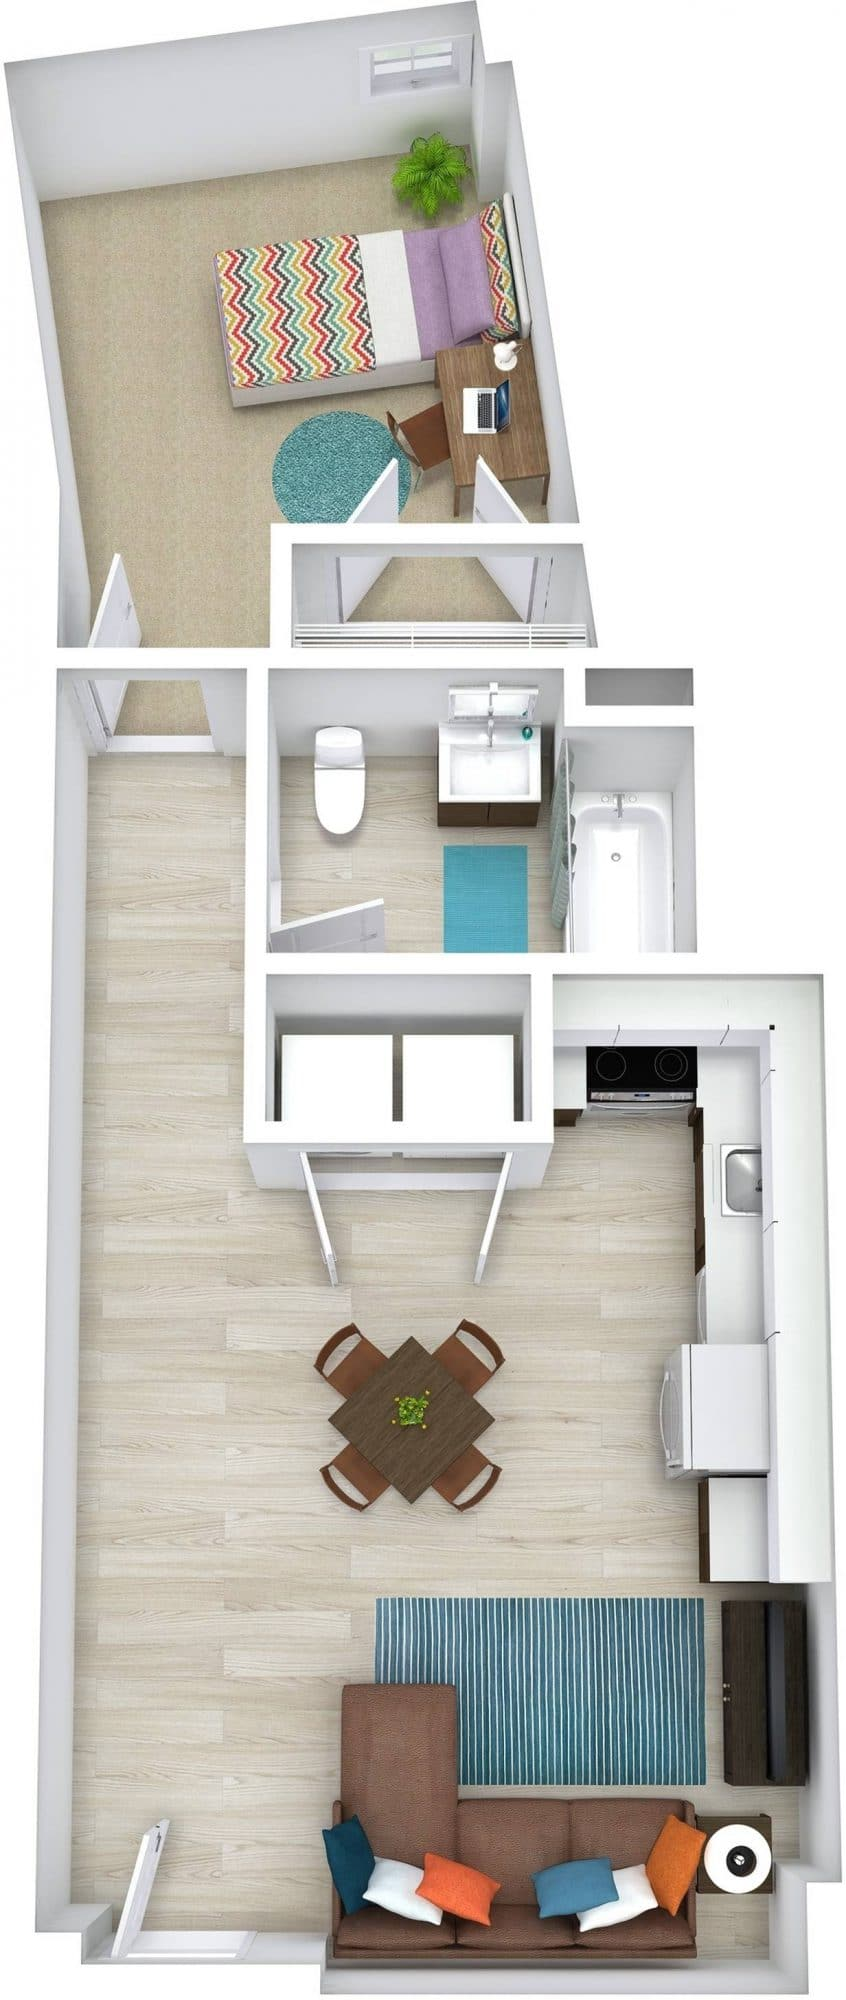 12 North Floor Plan 3